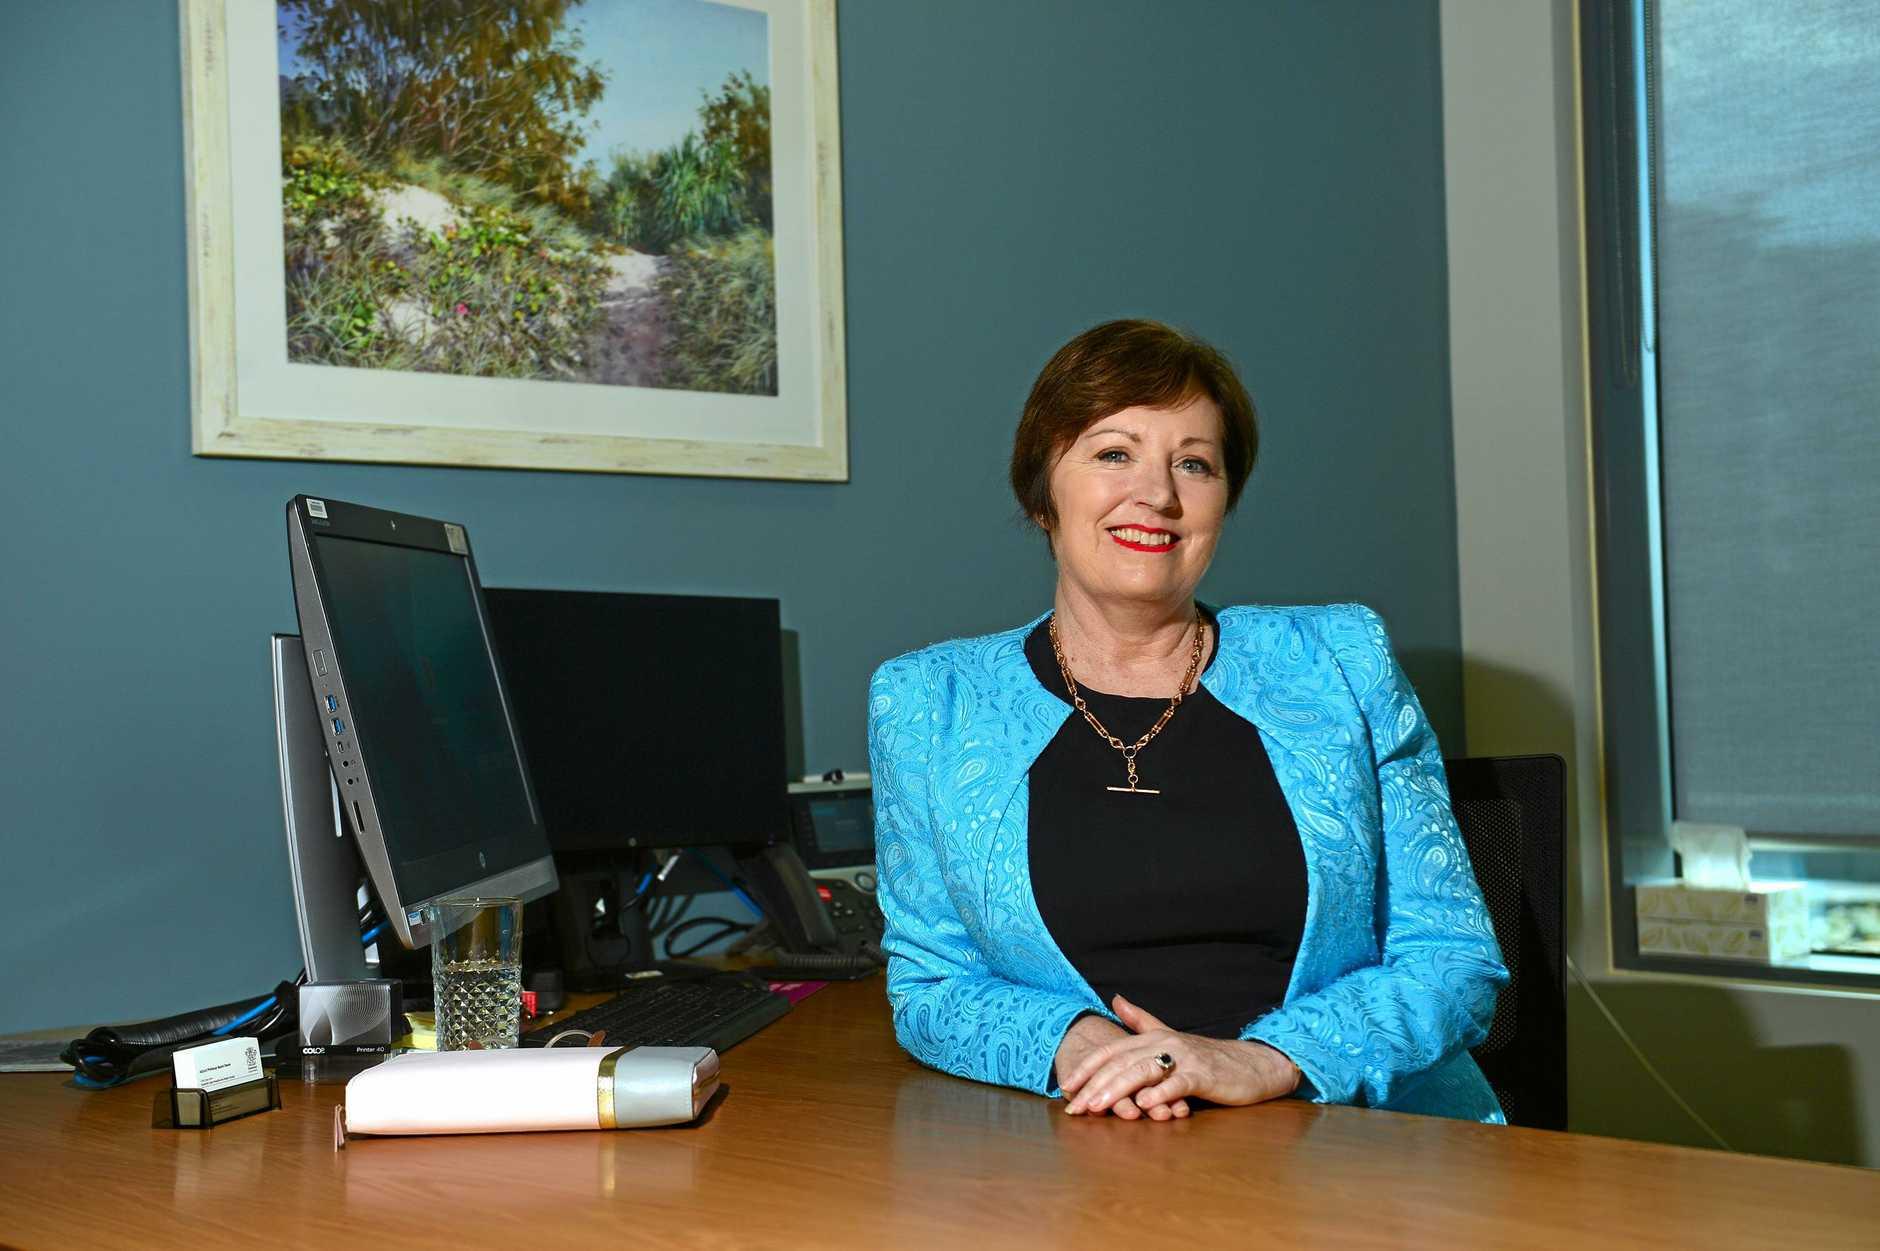 Chief Executive Sunshine Coast Health Service, Adjunct Professor Naomi Dwyer at the Sunshine Coast Univerity Hospital.